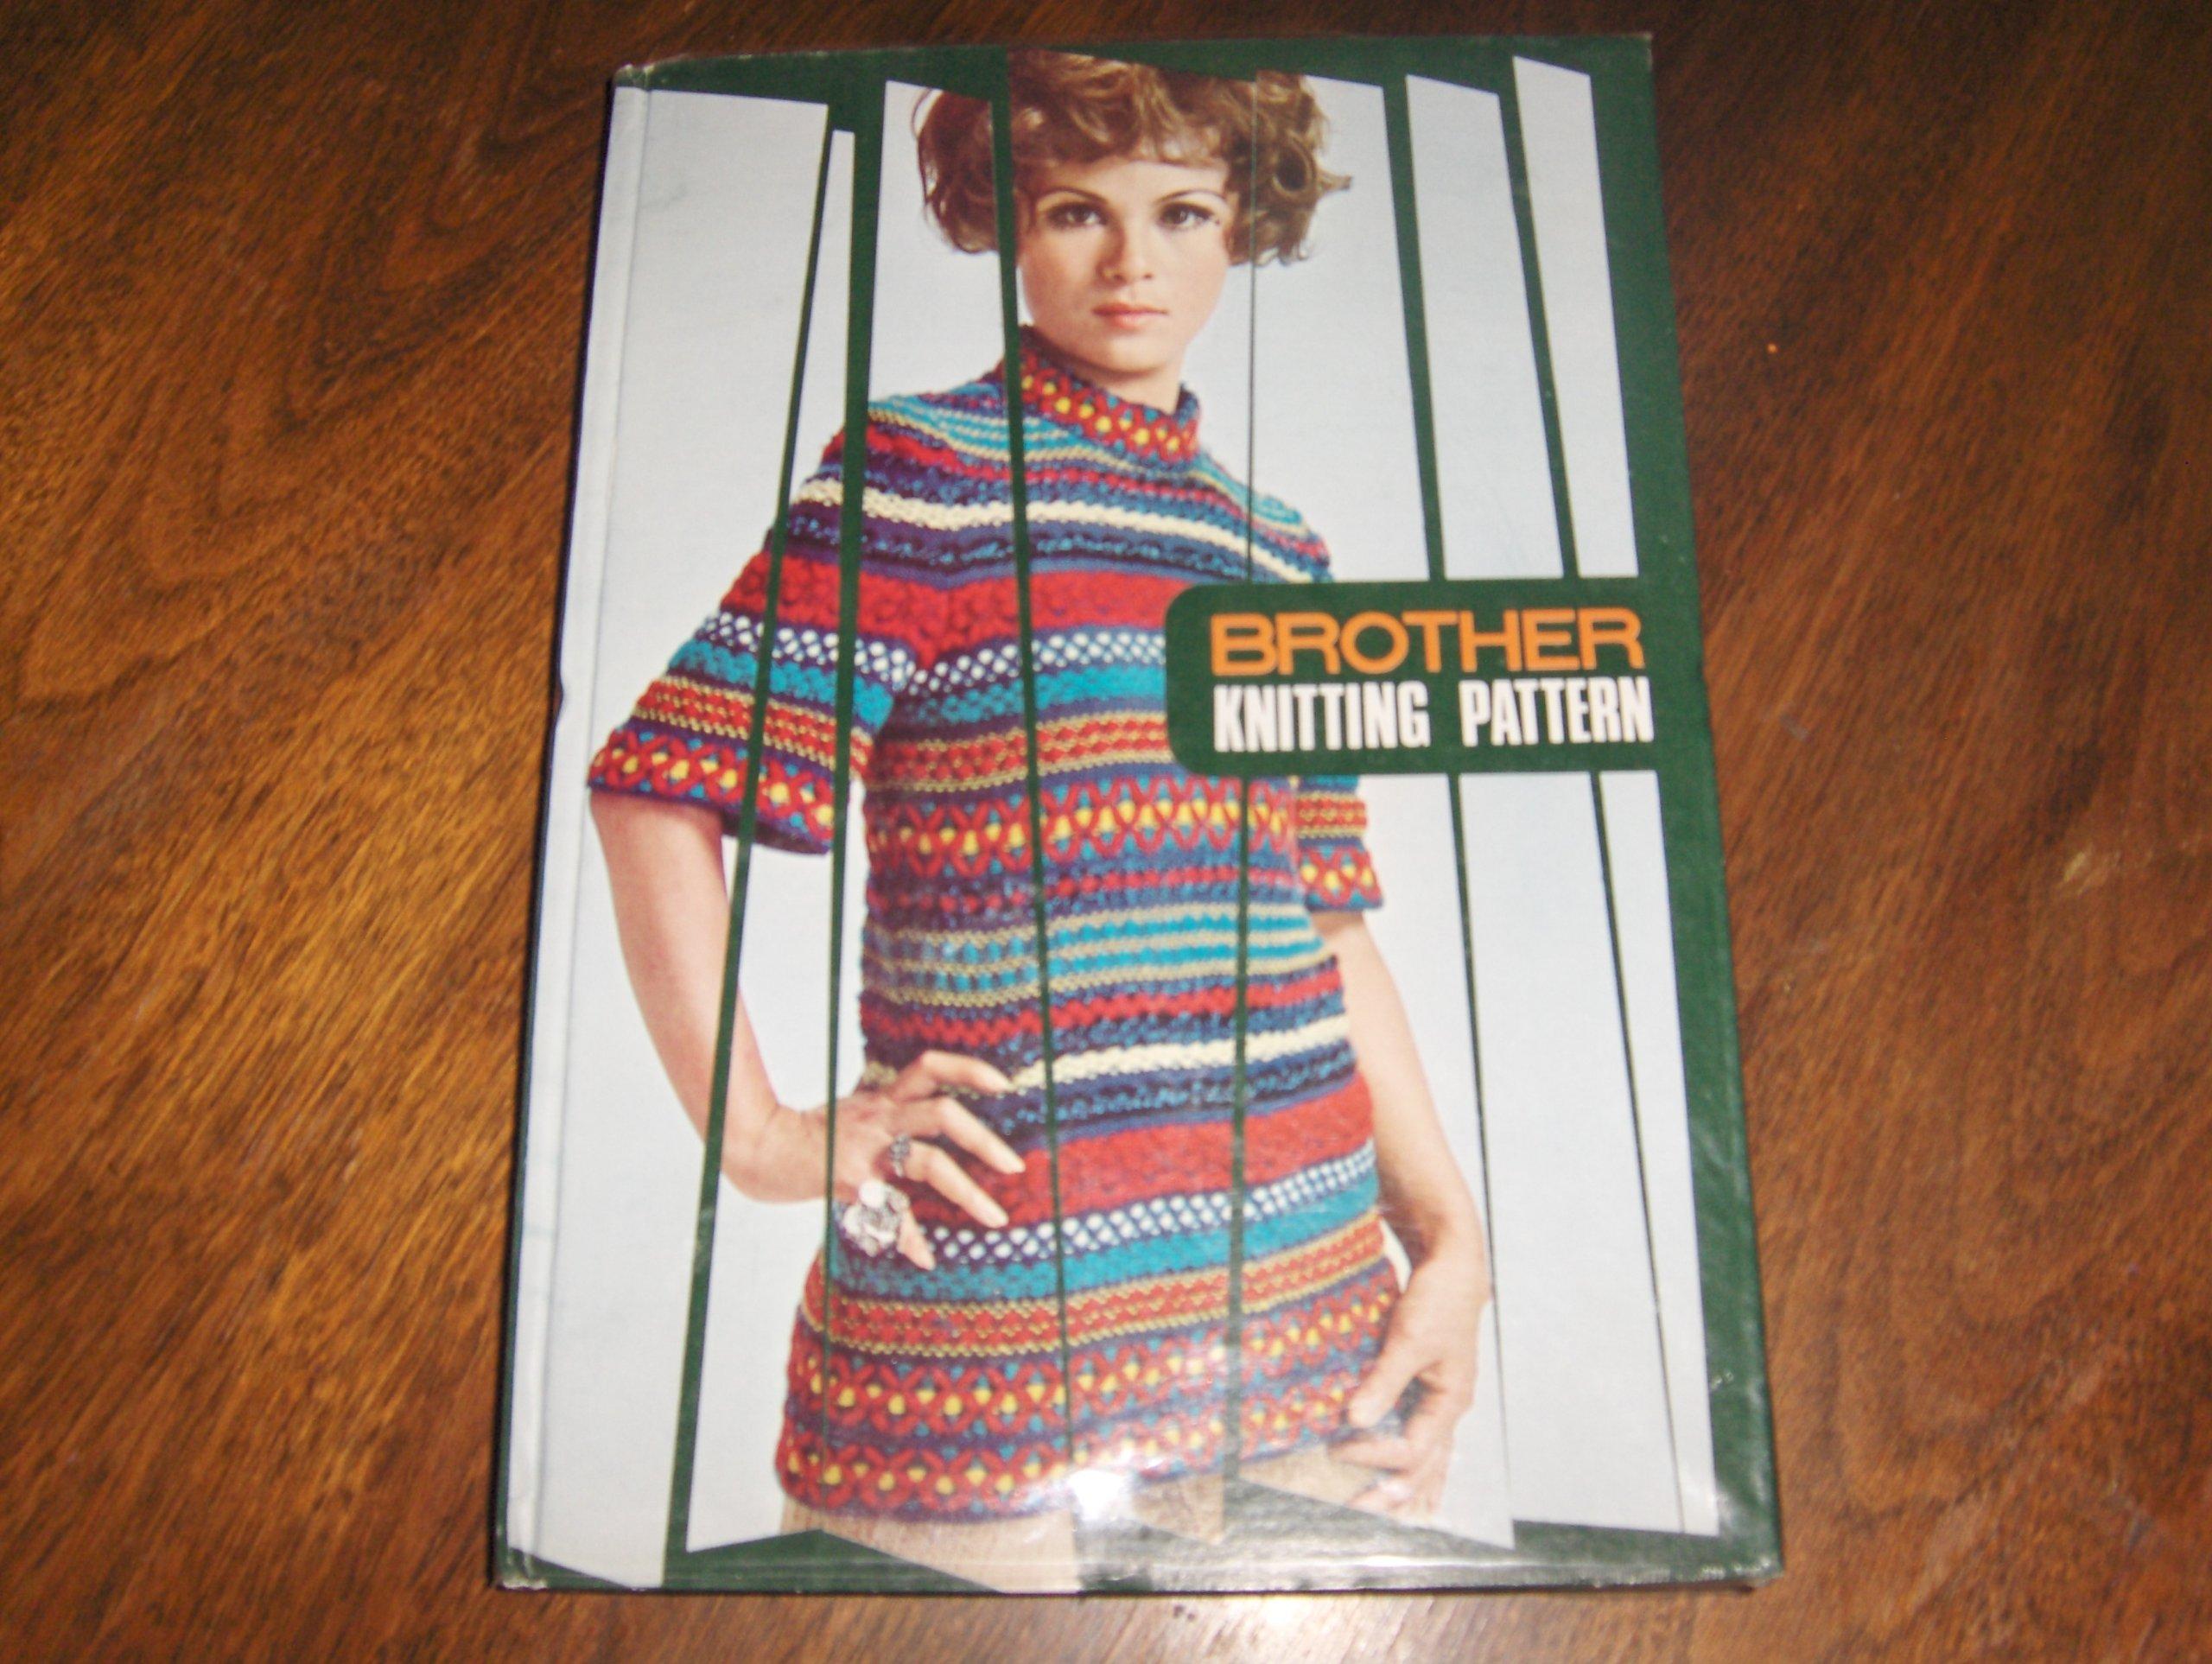 Brother Knitting Machine Patterns - Patterns Gallery